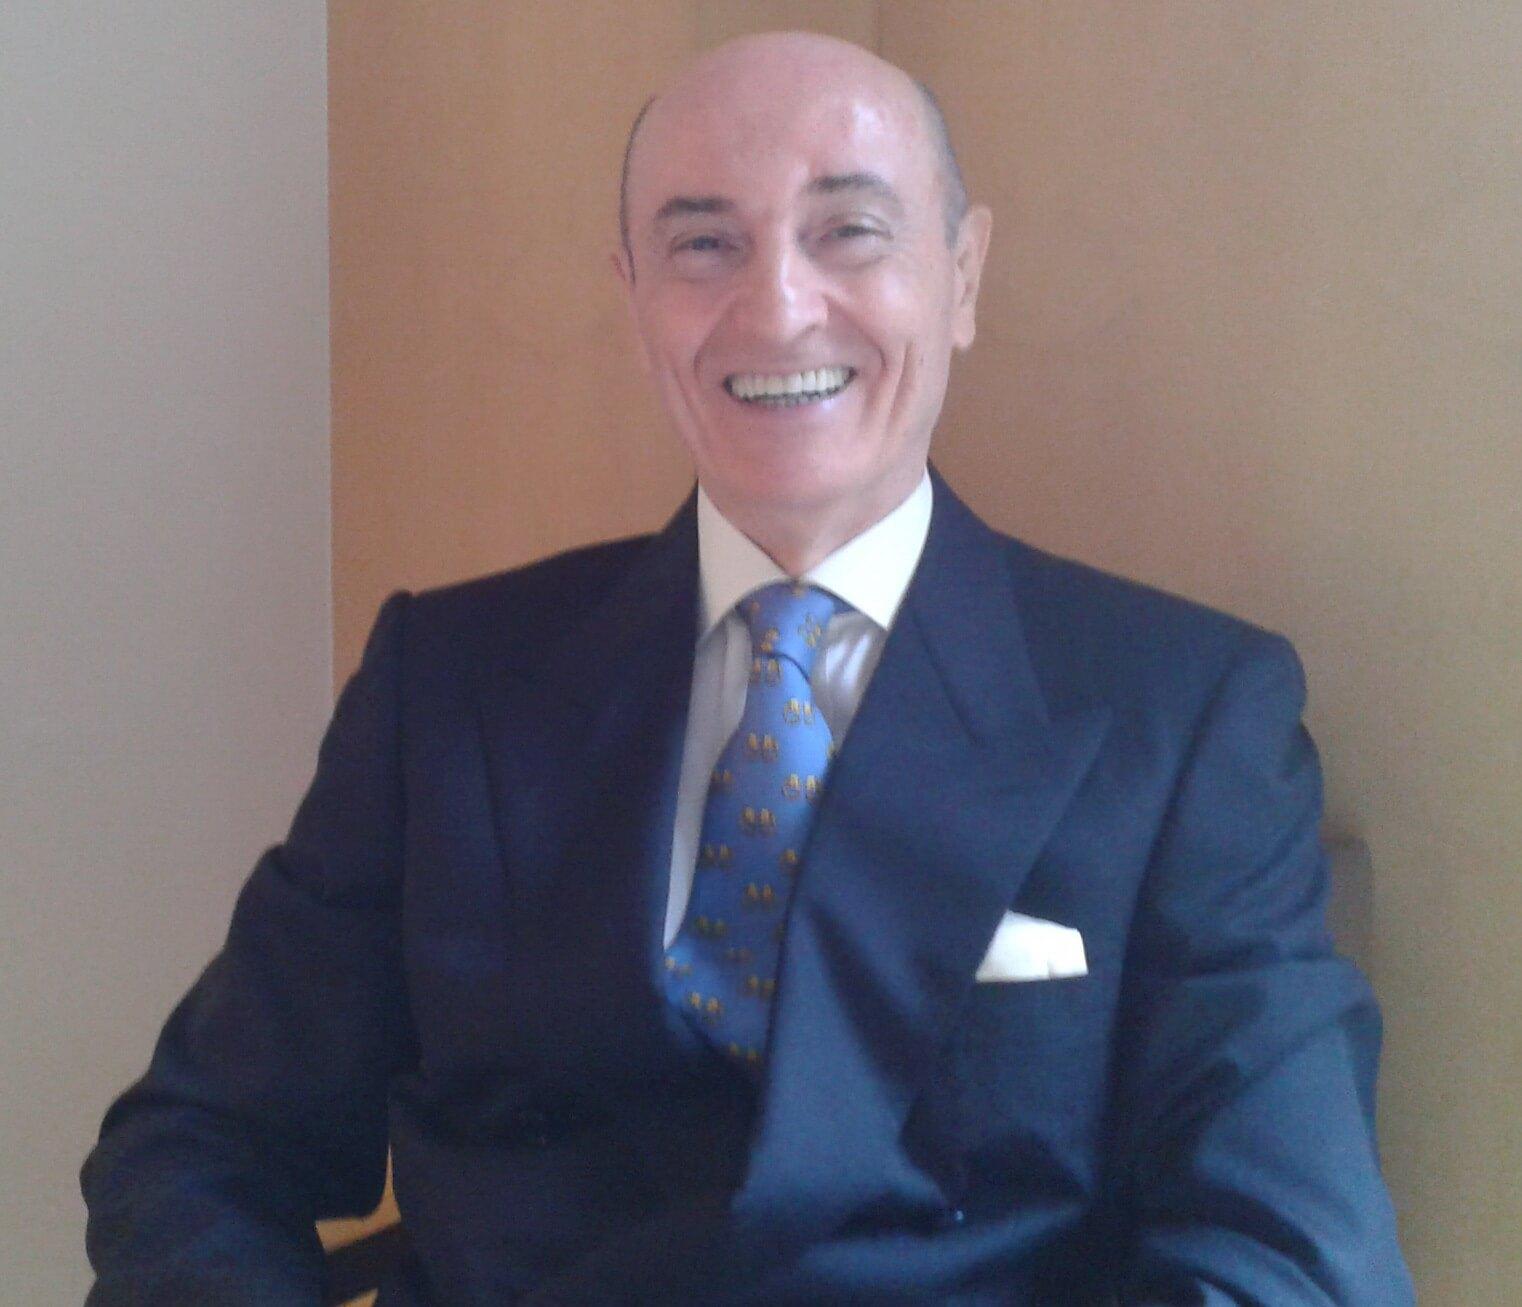 Dr Ivanovitch